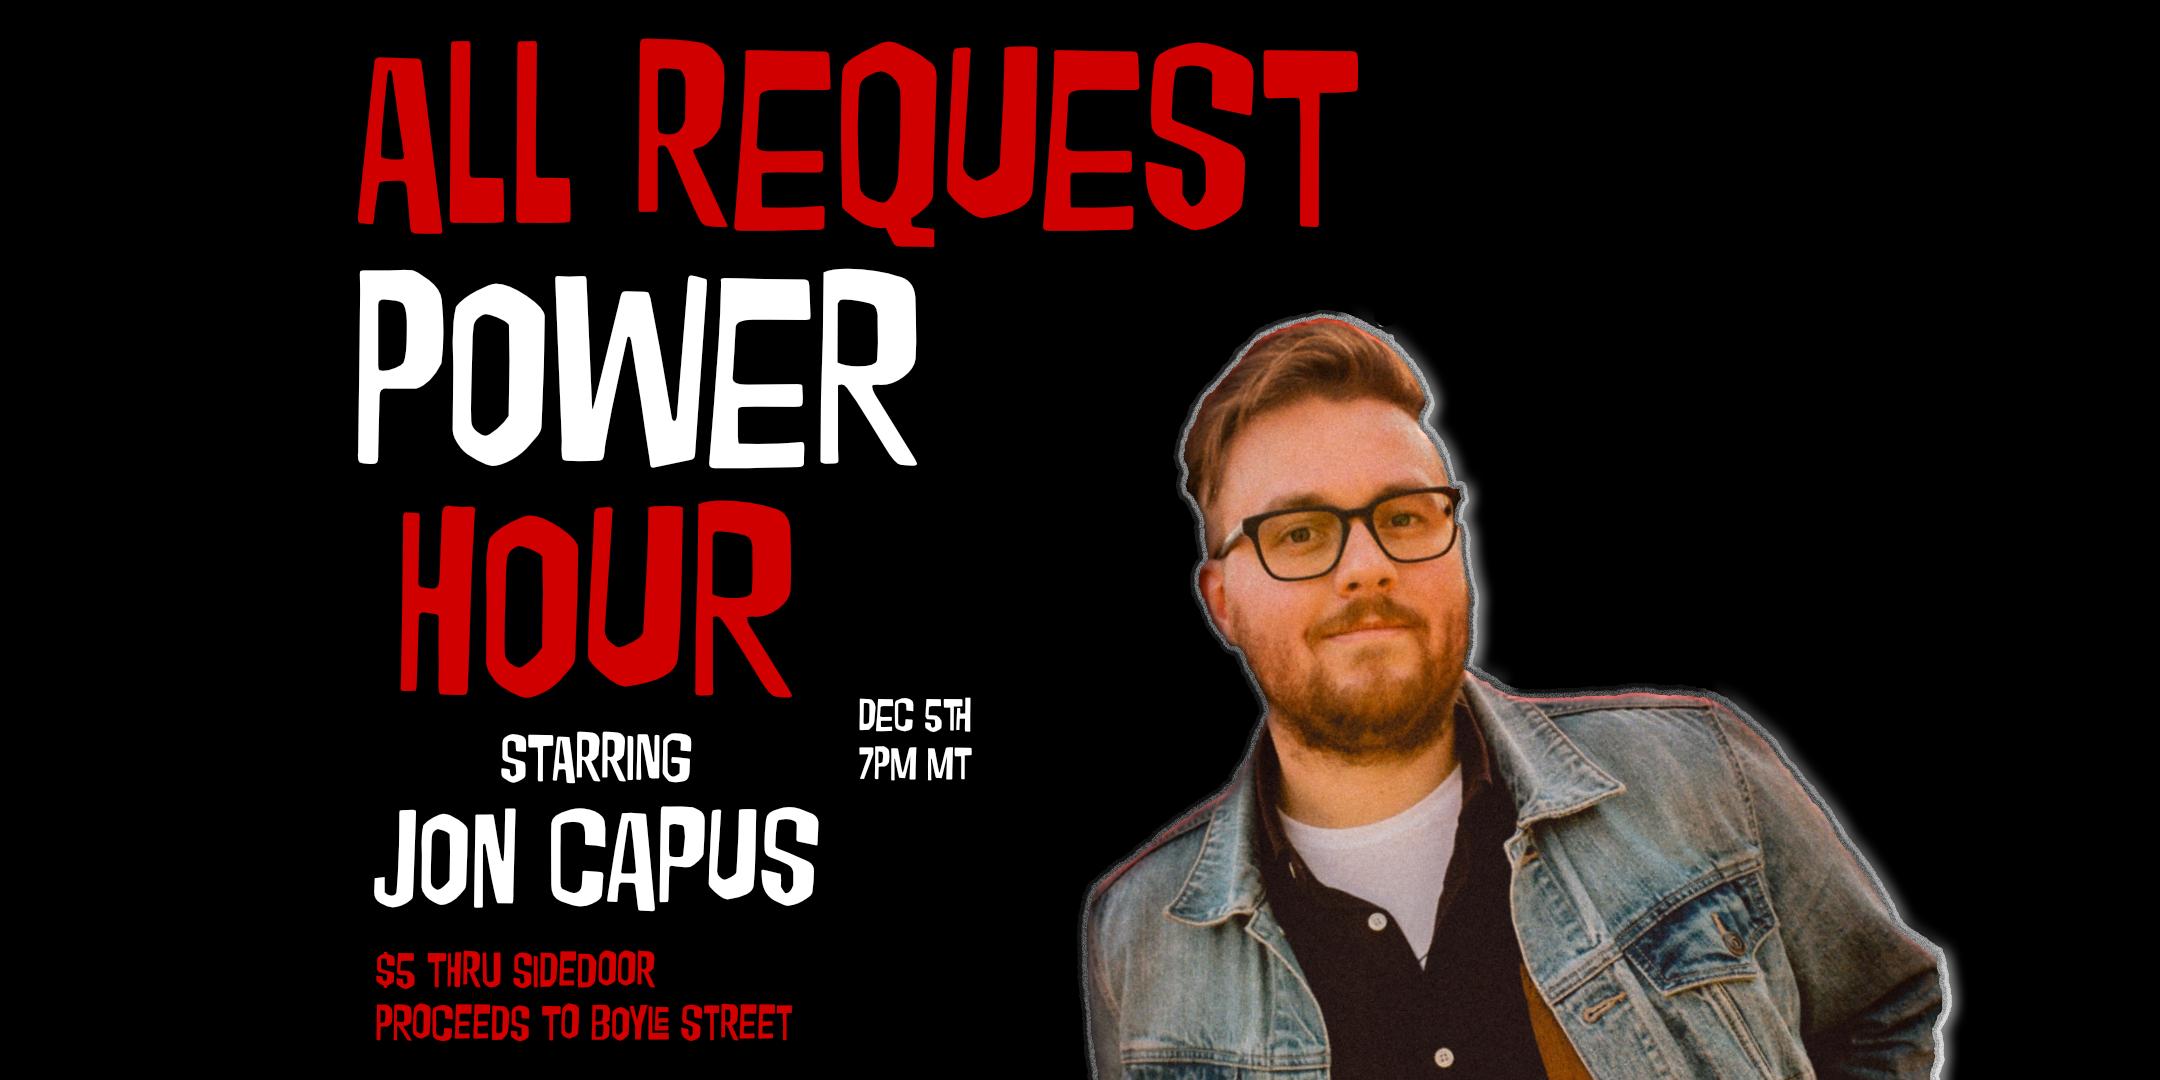 All Request Power Hour Starring Jon Capus (Show Announcement)